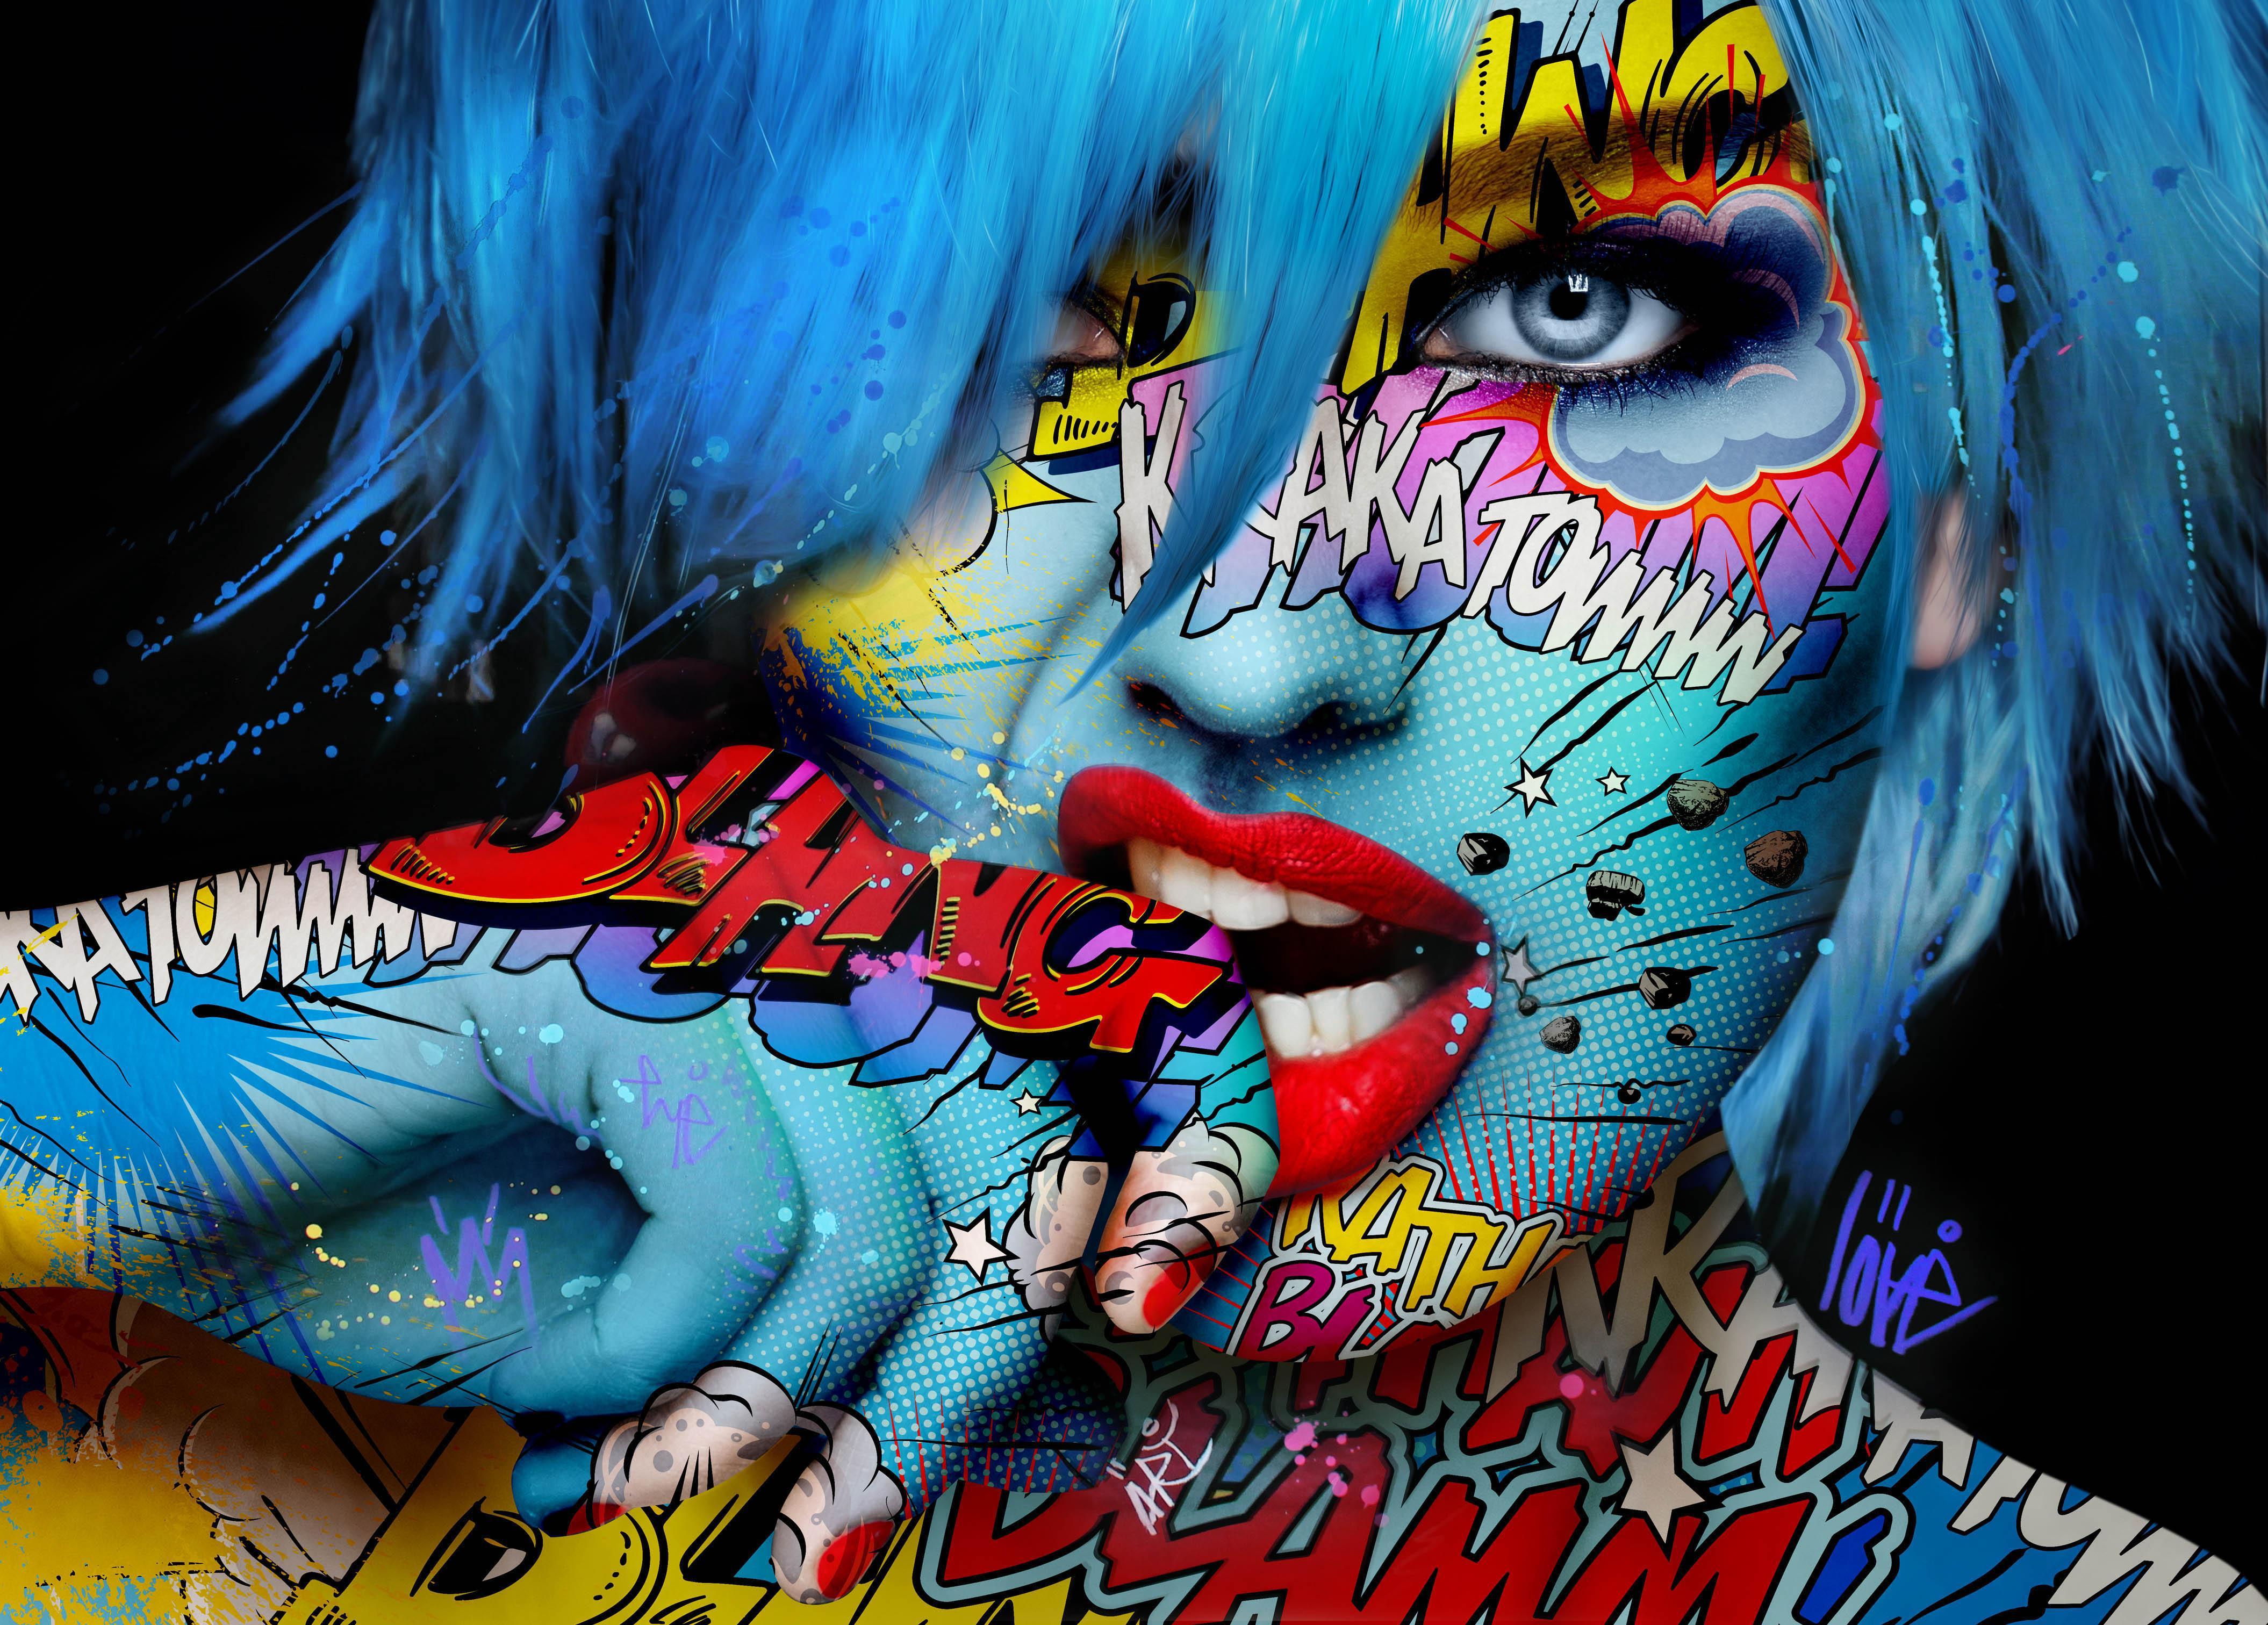 """Viva Glam"" -- Pop art, pop culture, feminism, woman power, woman empowerment"